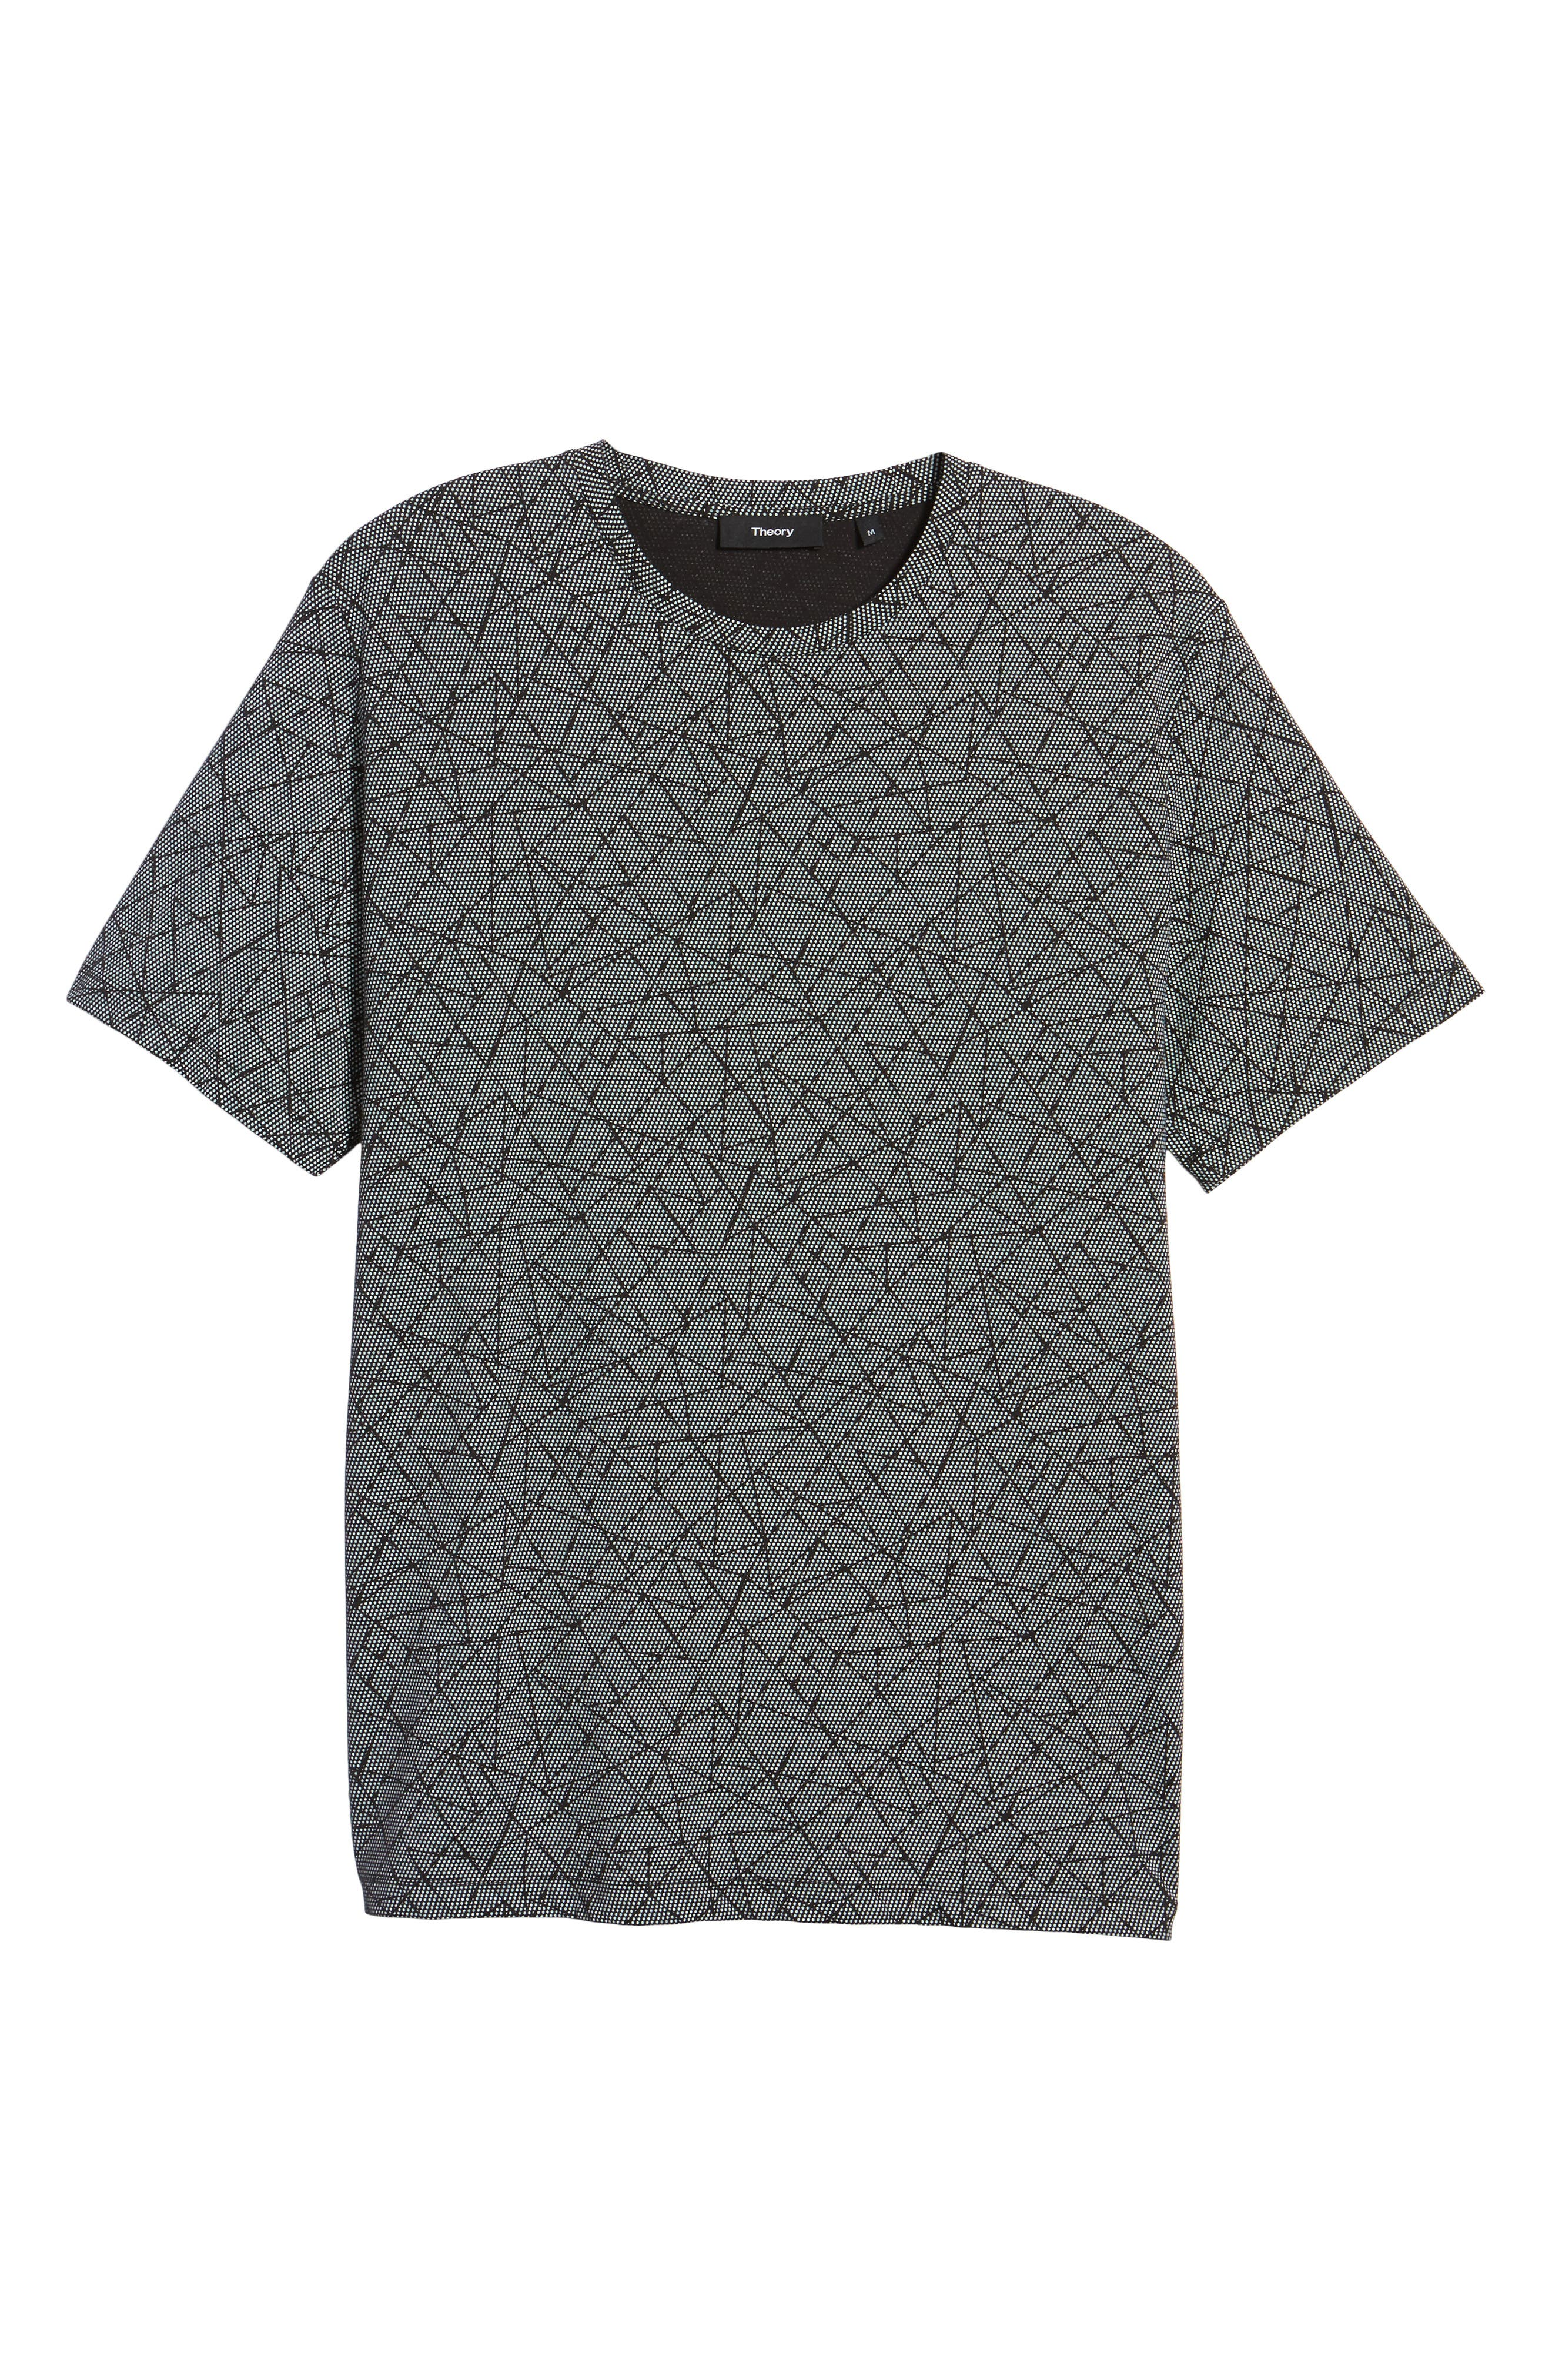 Clean T-Shirt,                             Alternate thumbnail 5, color,                             Black/ White